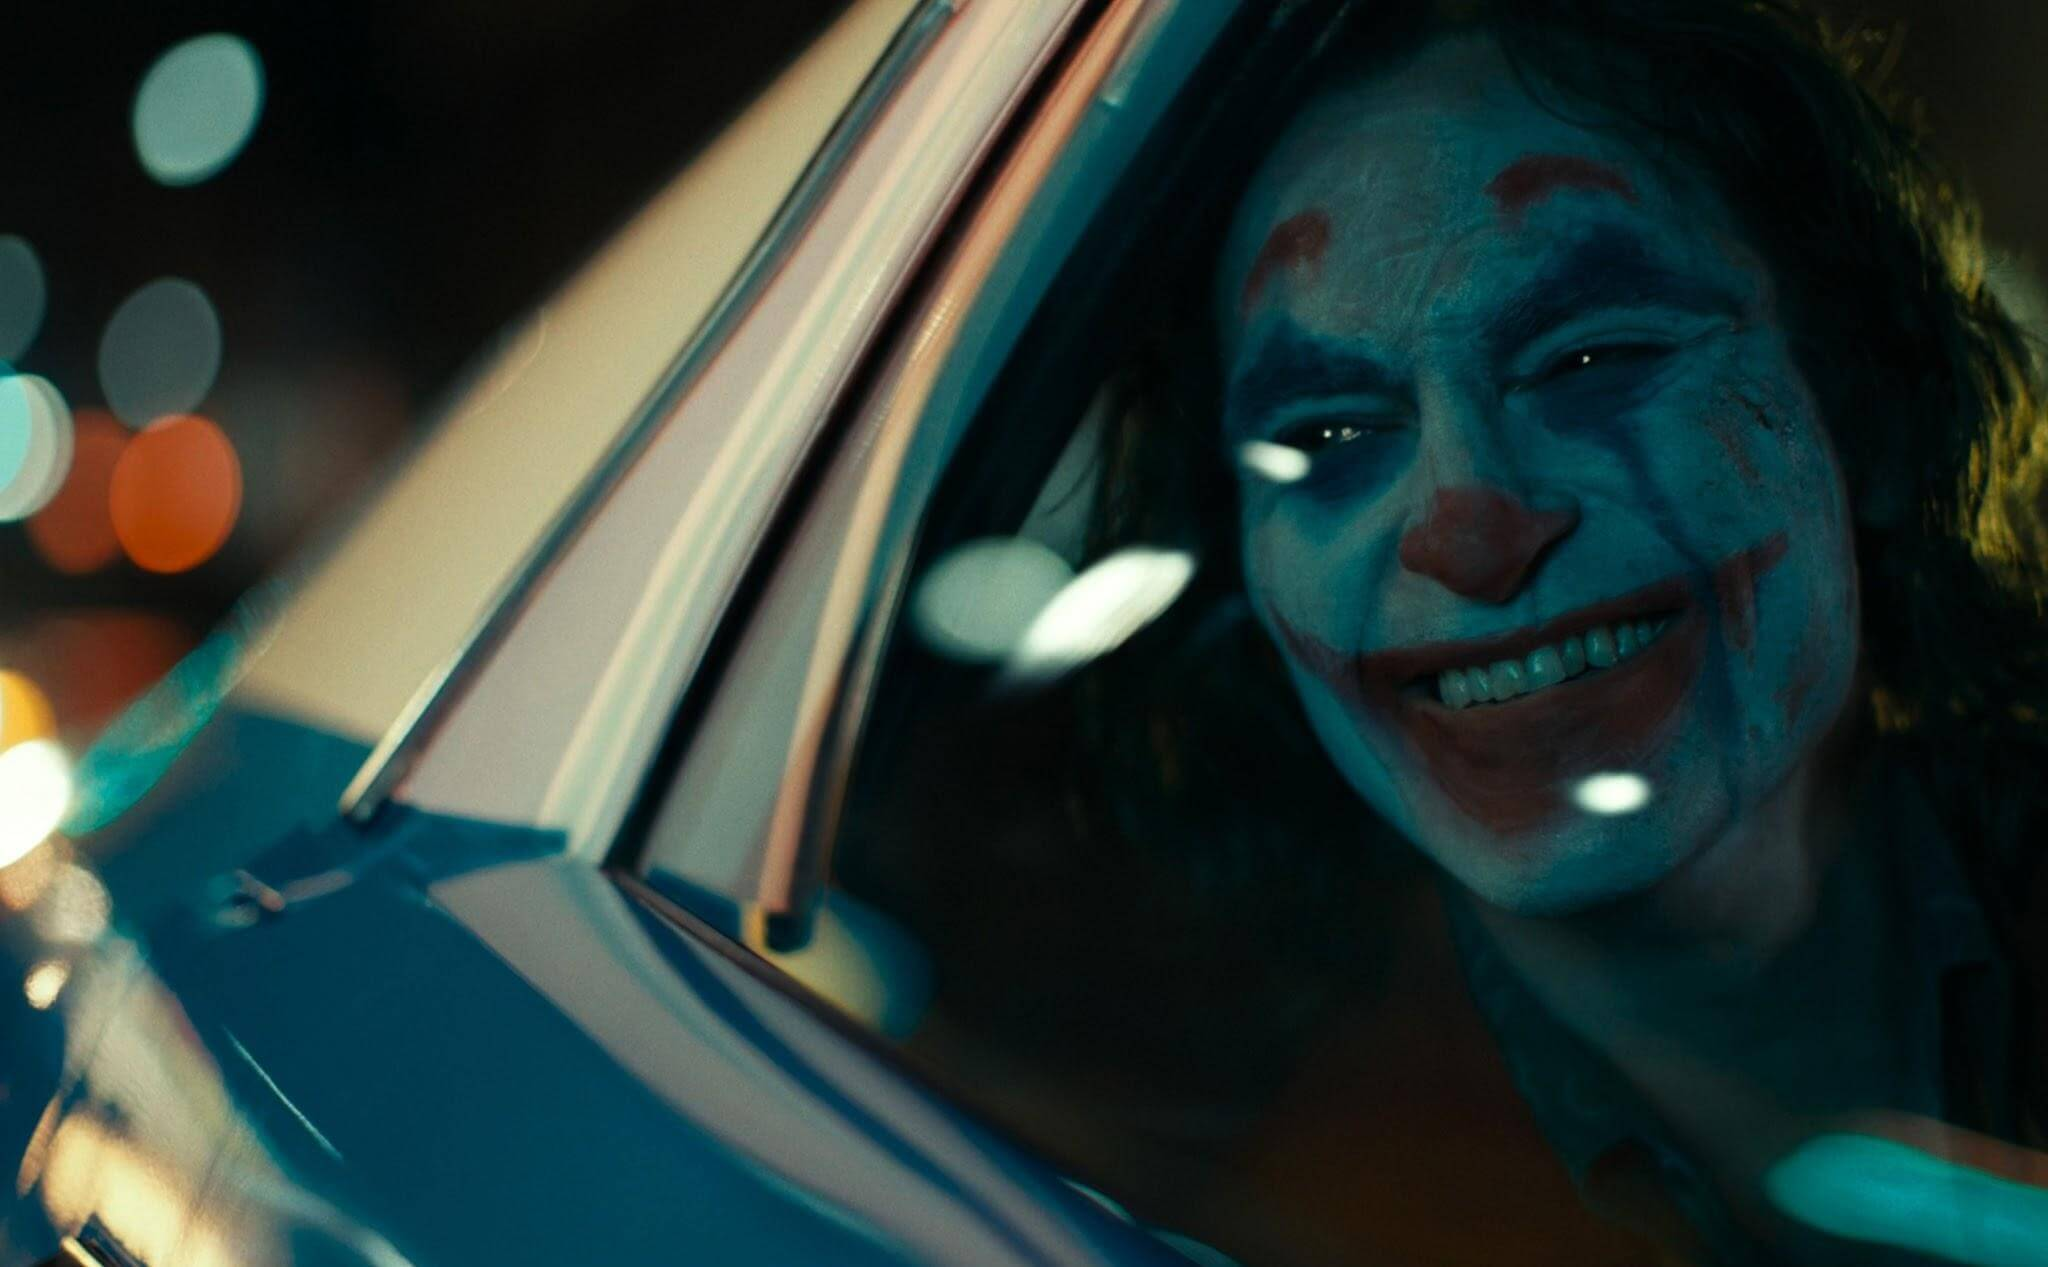 After the Joker Murray scene